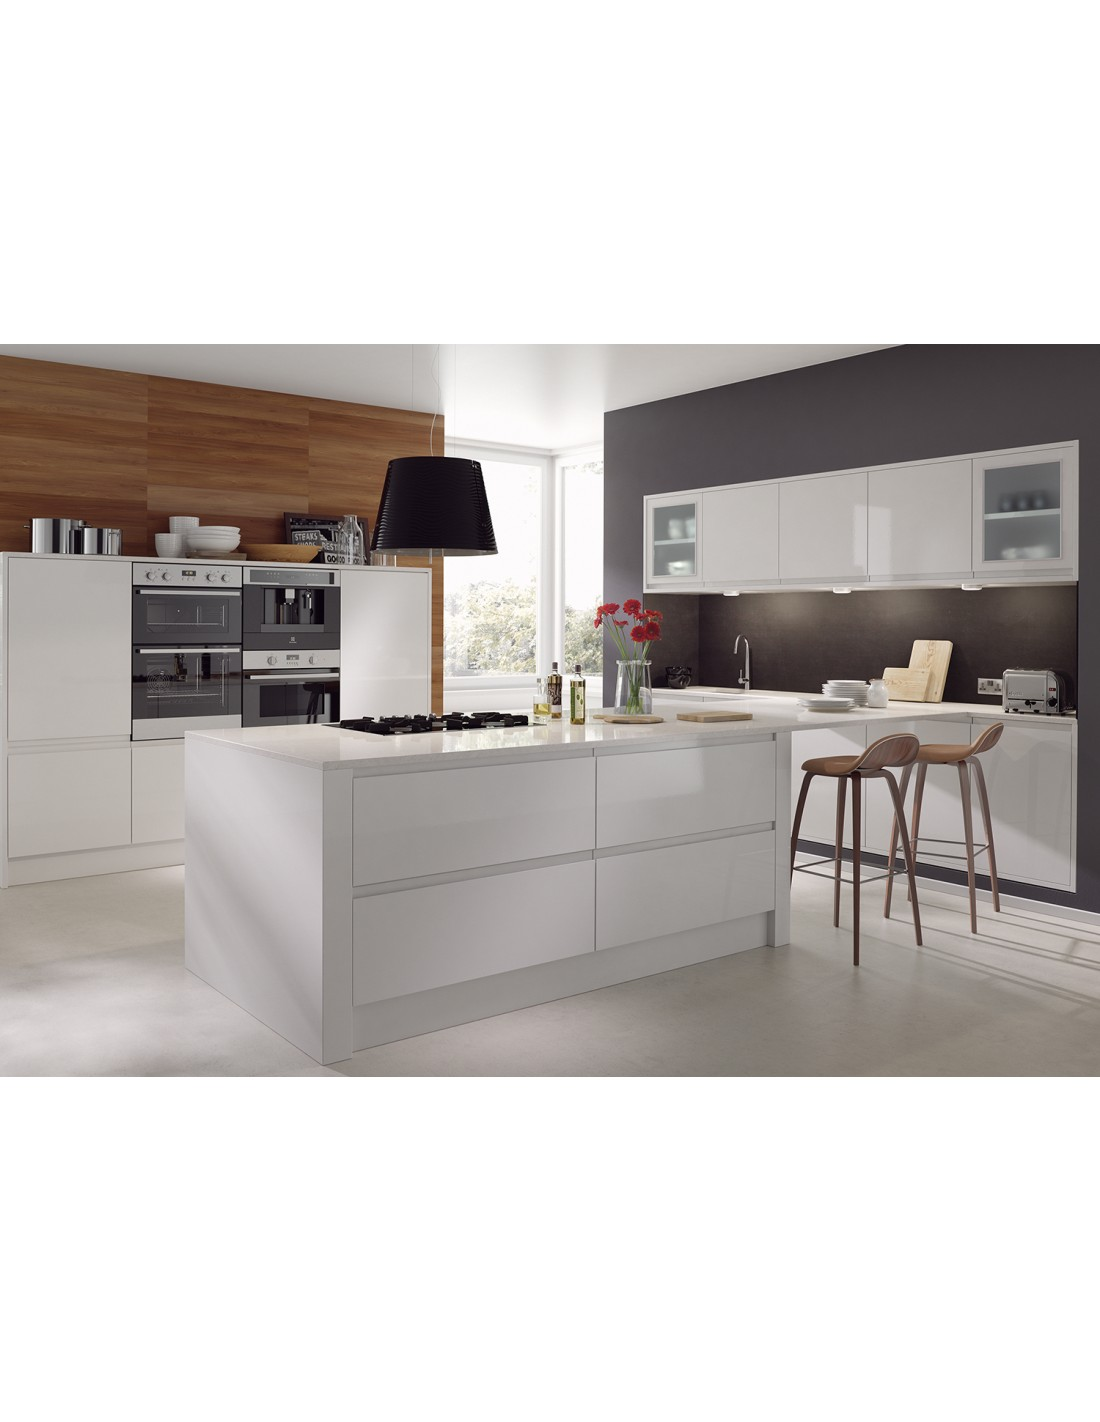 Avanti Opus White High Gloss J Pull Kitchen Doors, 22mm